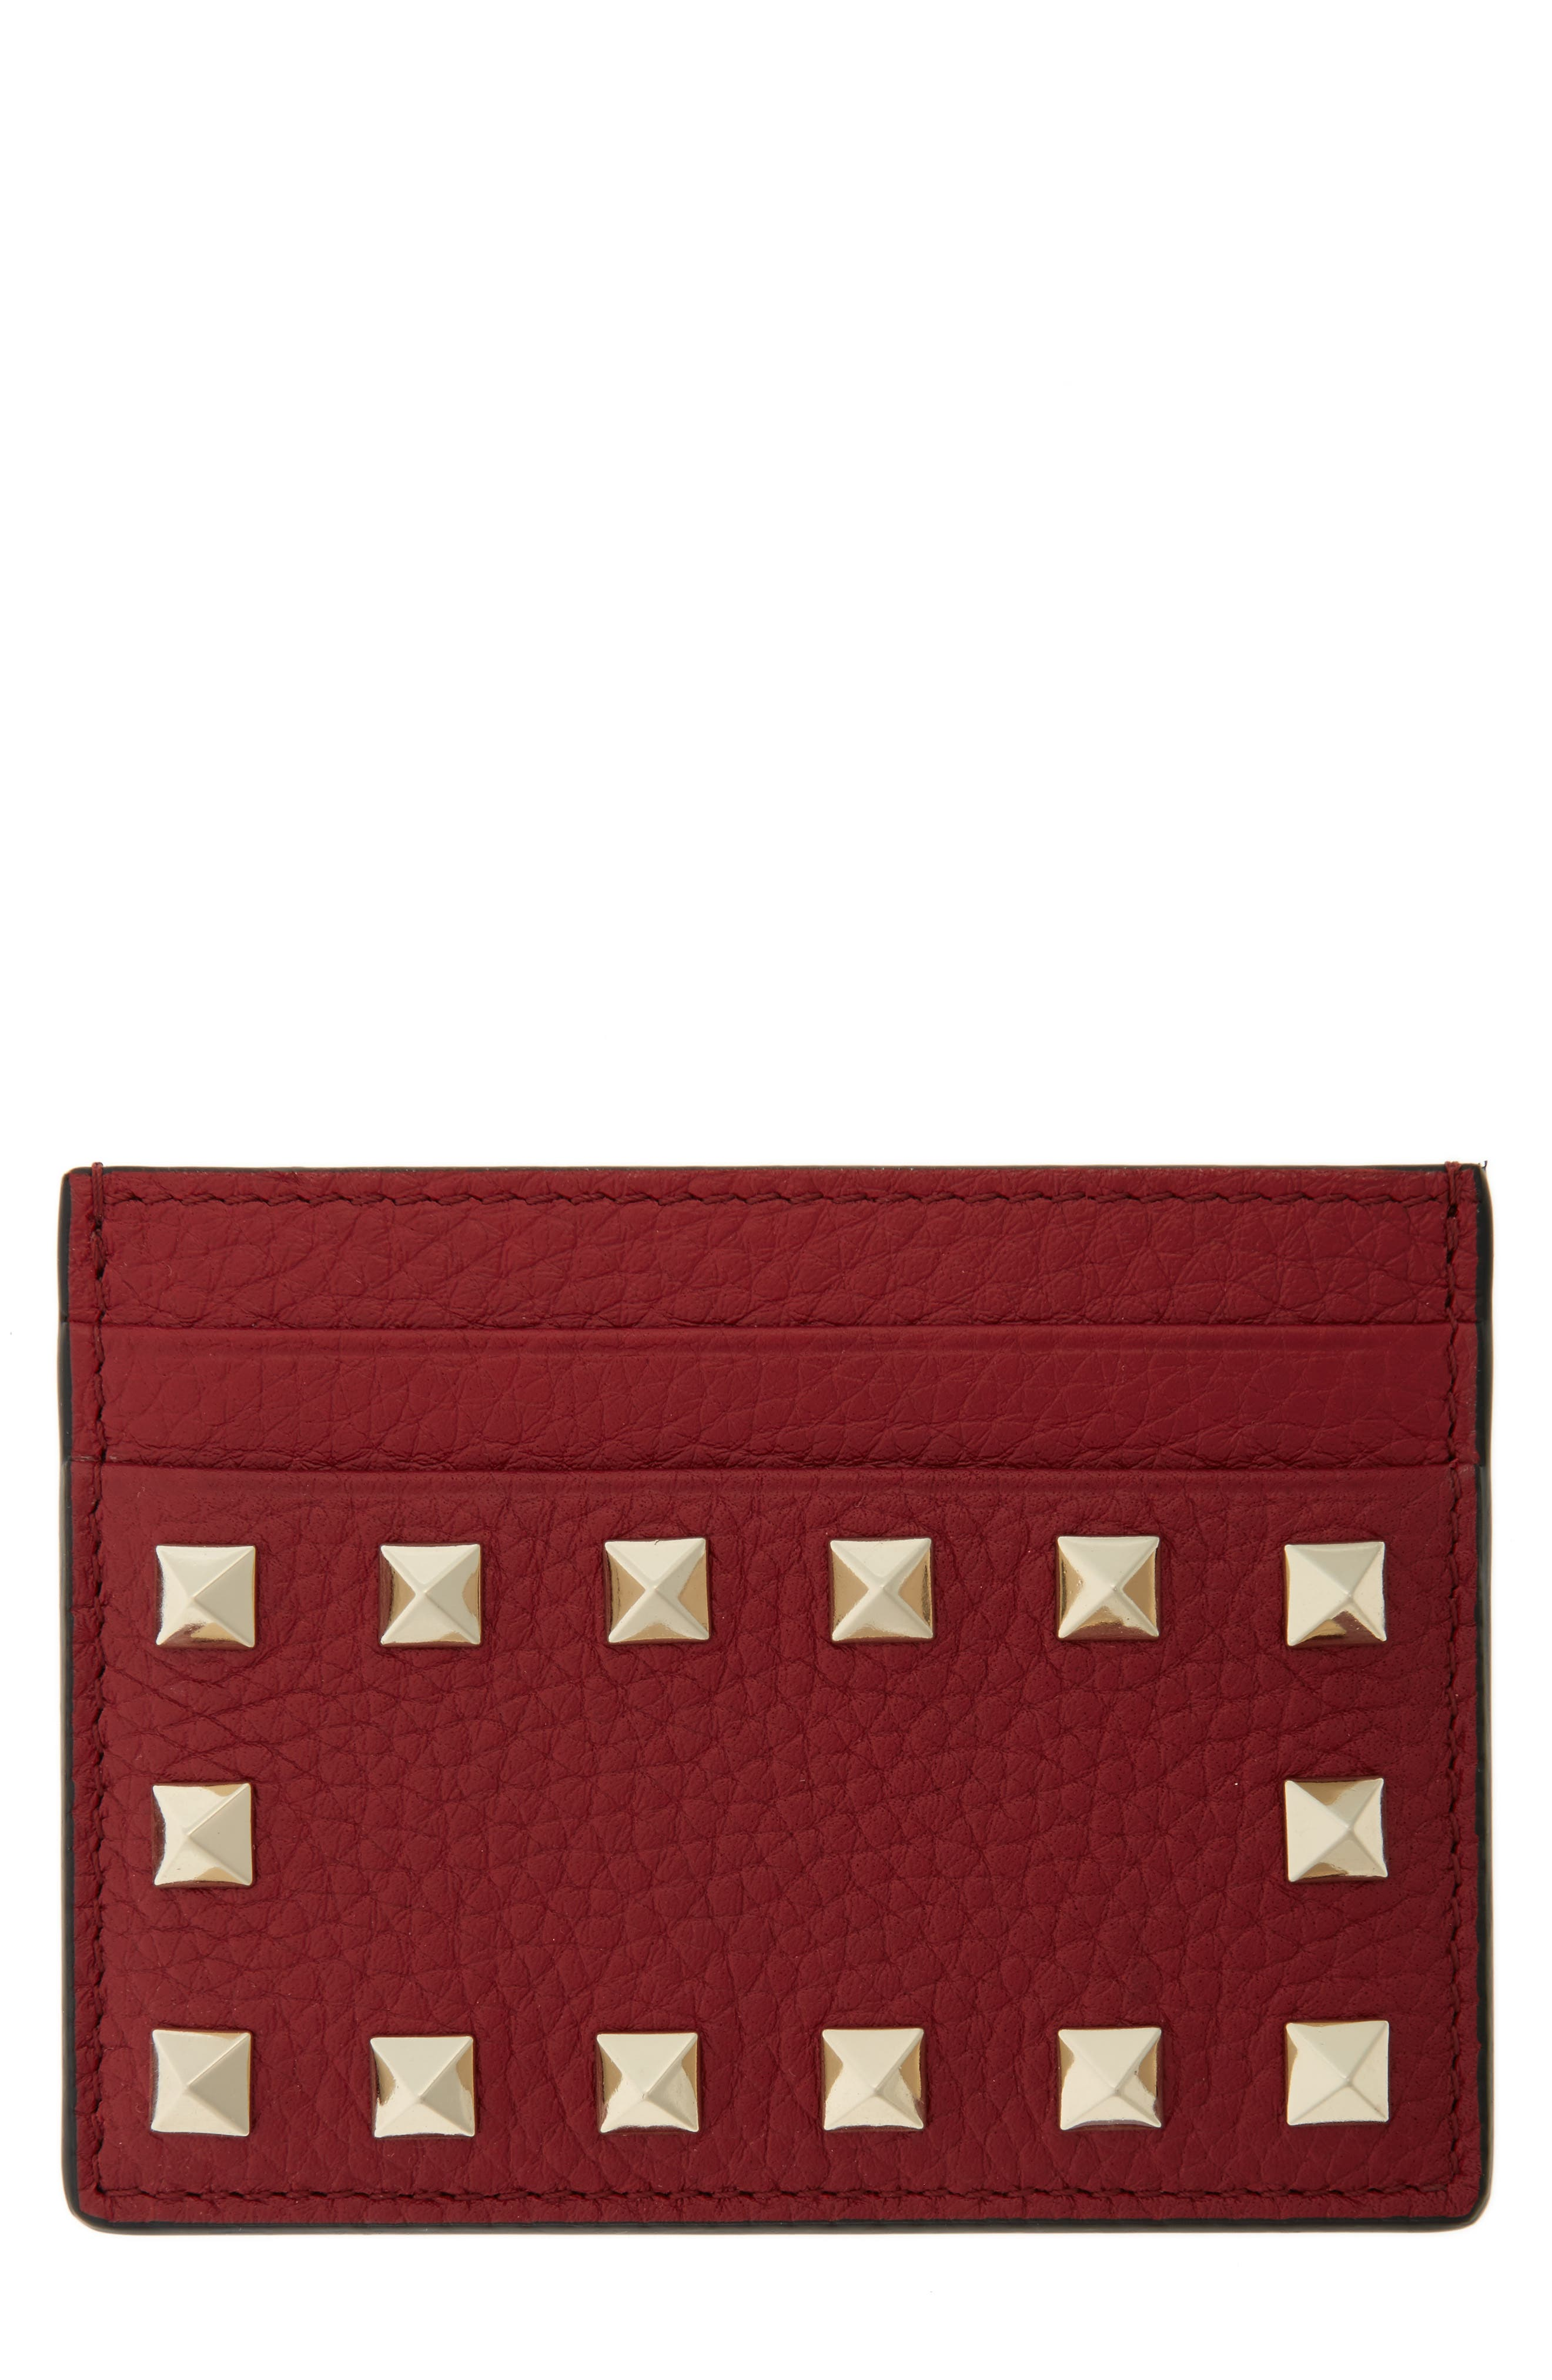 Alternate Image 1 Selected - VALENTINO GARAVANI Rockstud Leather Card Holder